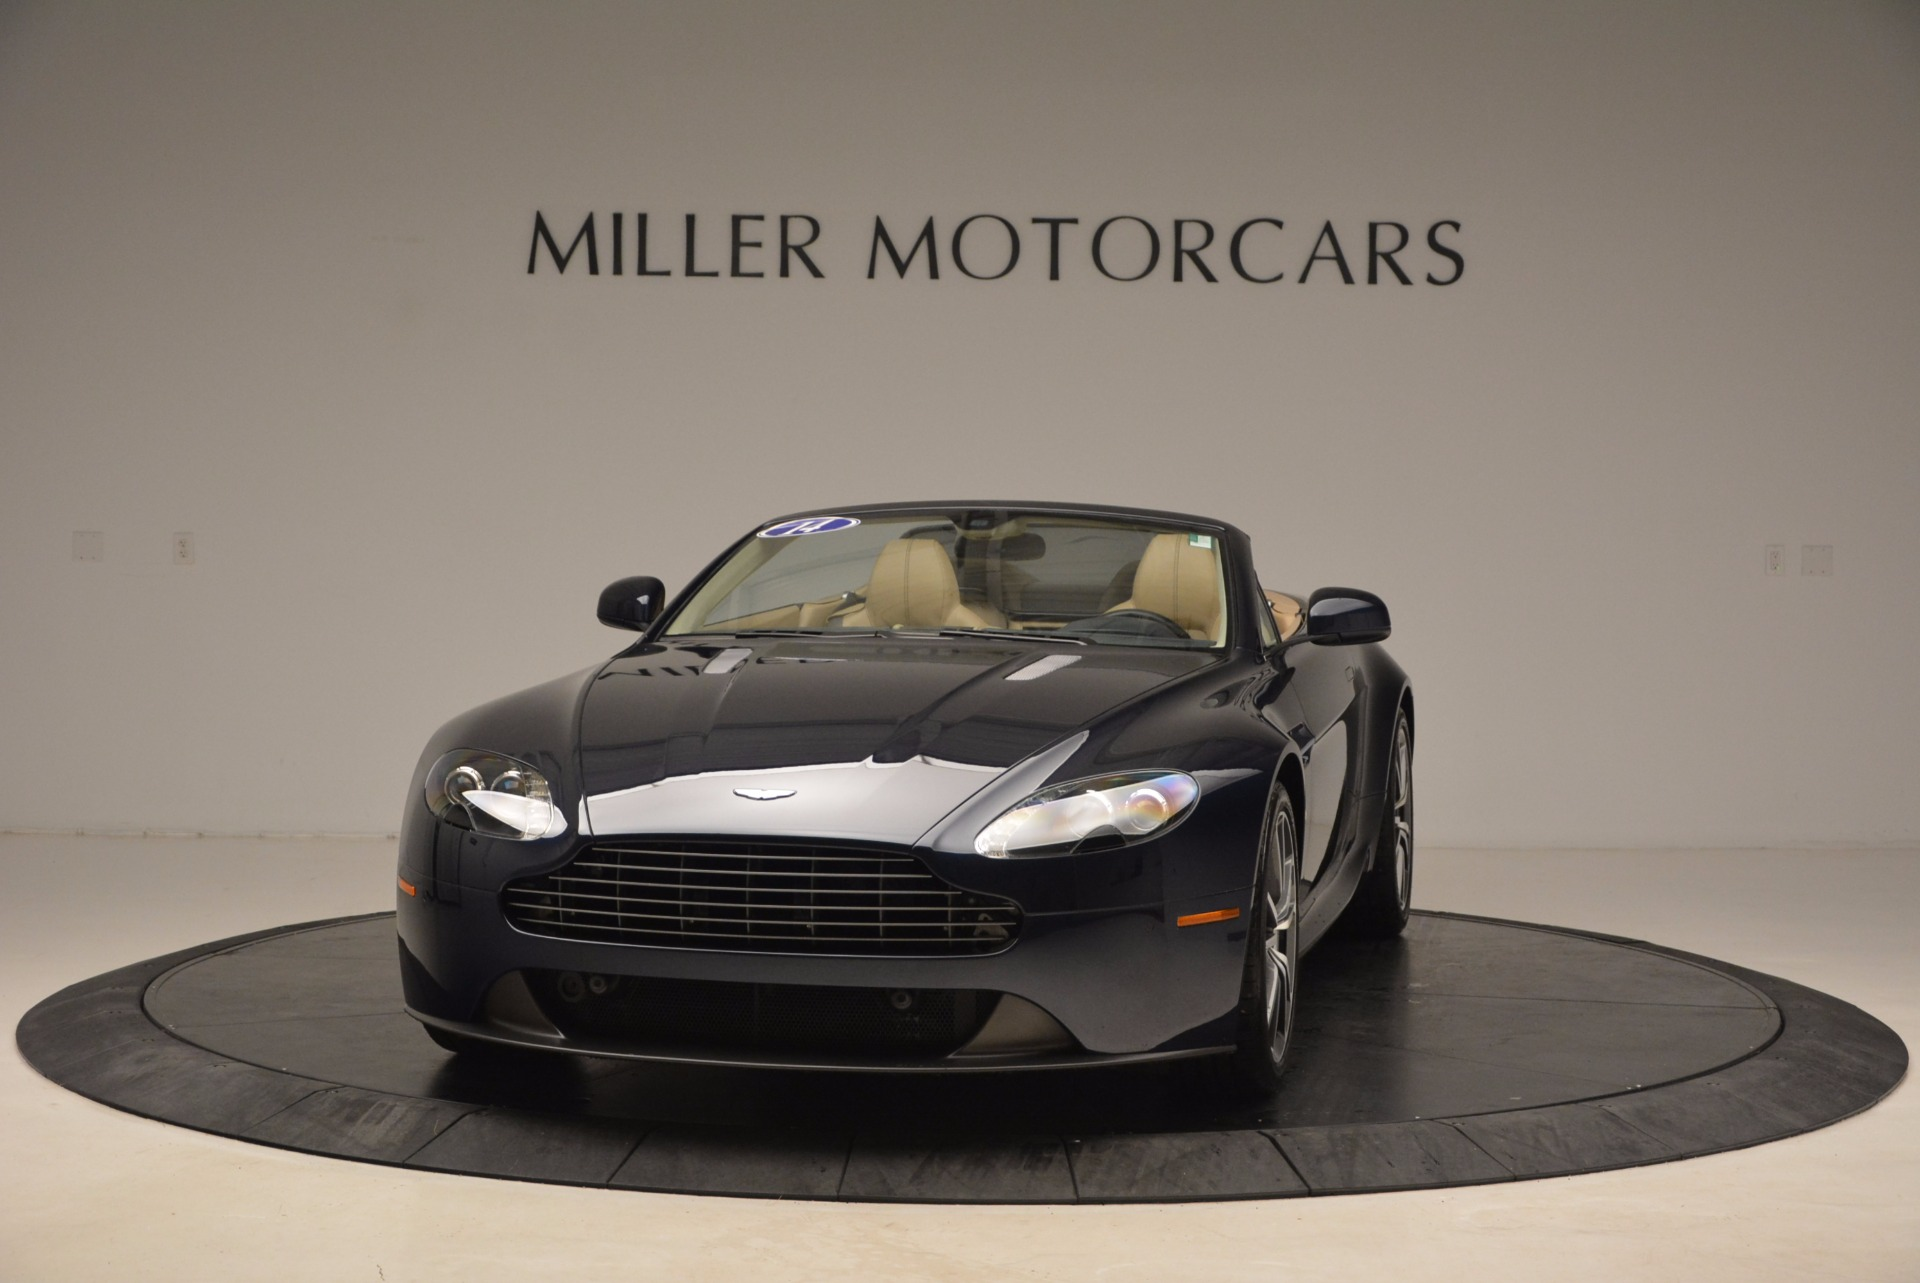 Used 2014 Aston Martin V8 Vantage Roadster For Sale In Westport, CT 1623_main